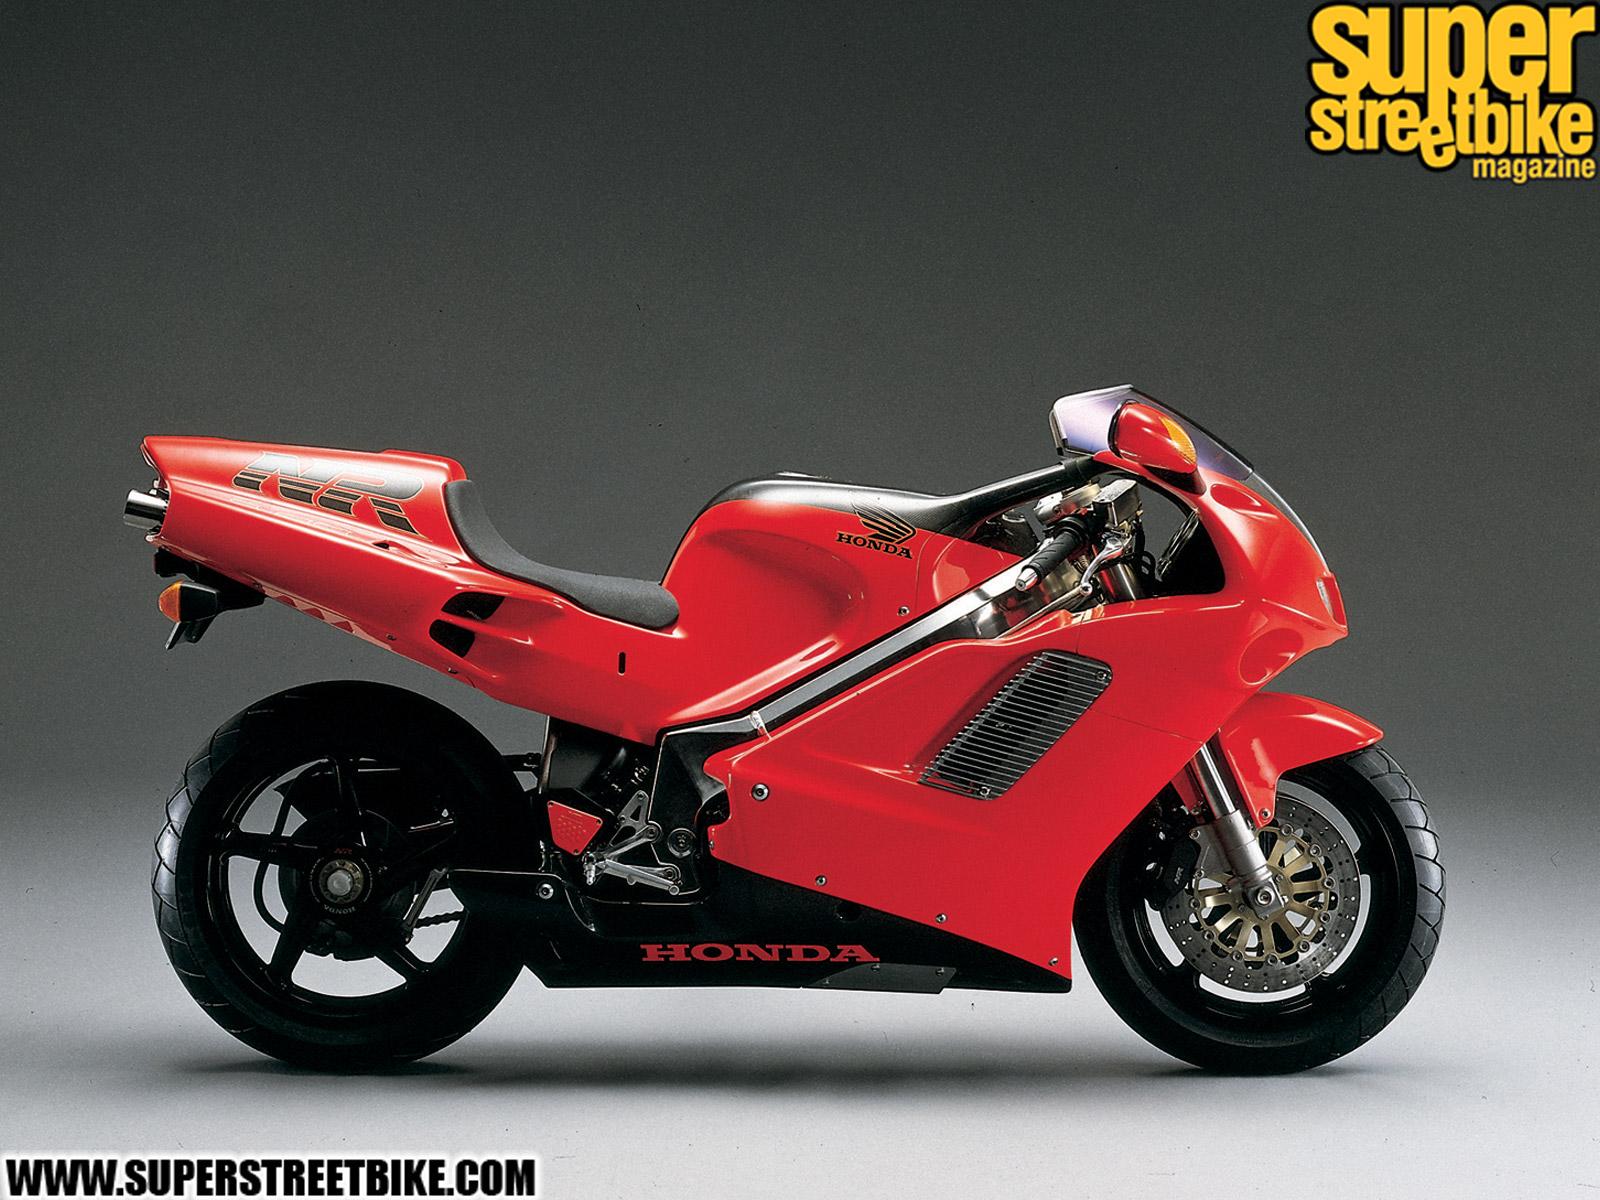 exotic bikes most super honda heavy bike nr motorcycle